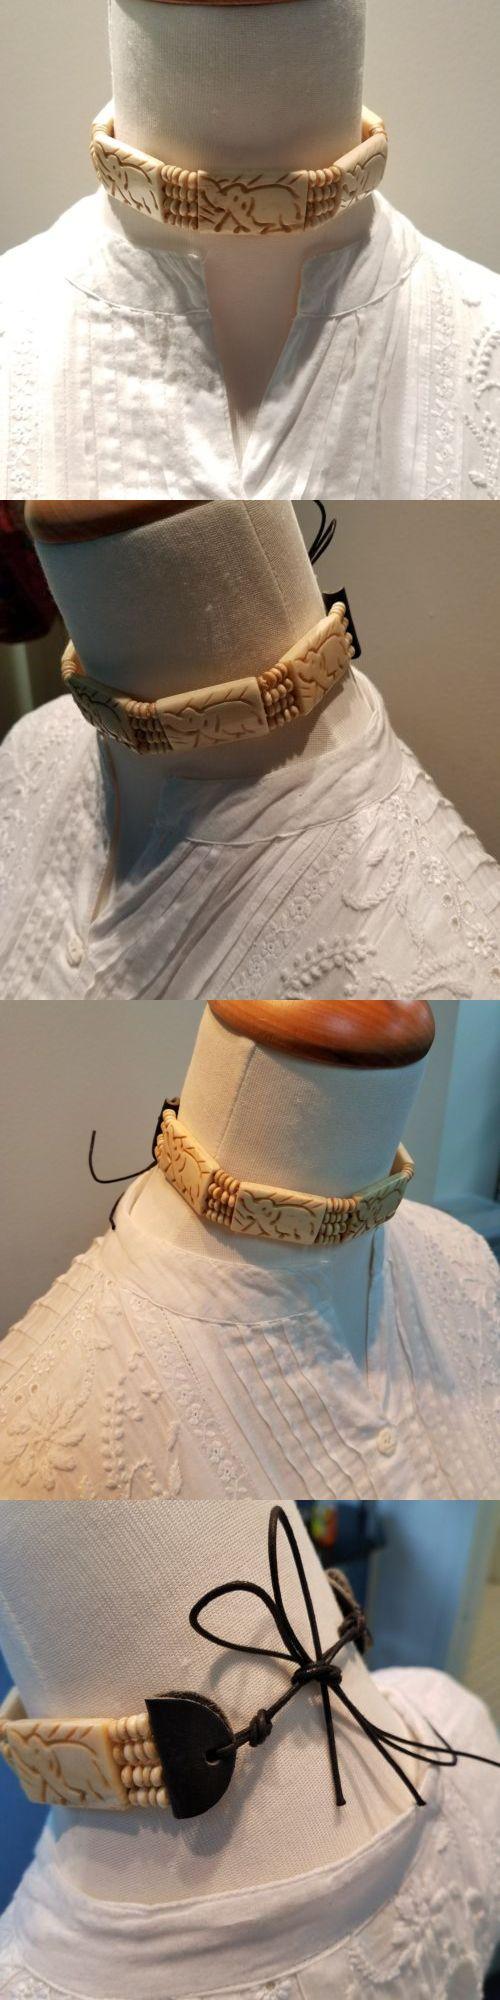 Native american wedding dress  Native American Bone Choker Navajo Jewelry Elephant Pattern Leather